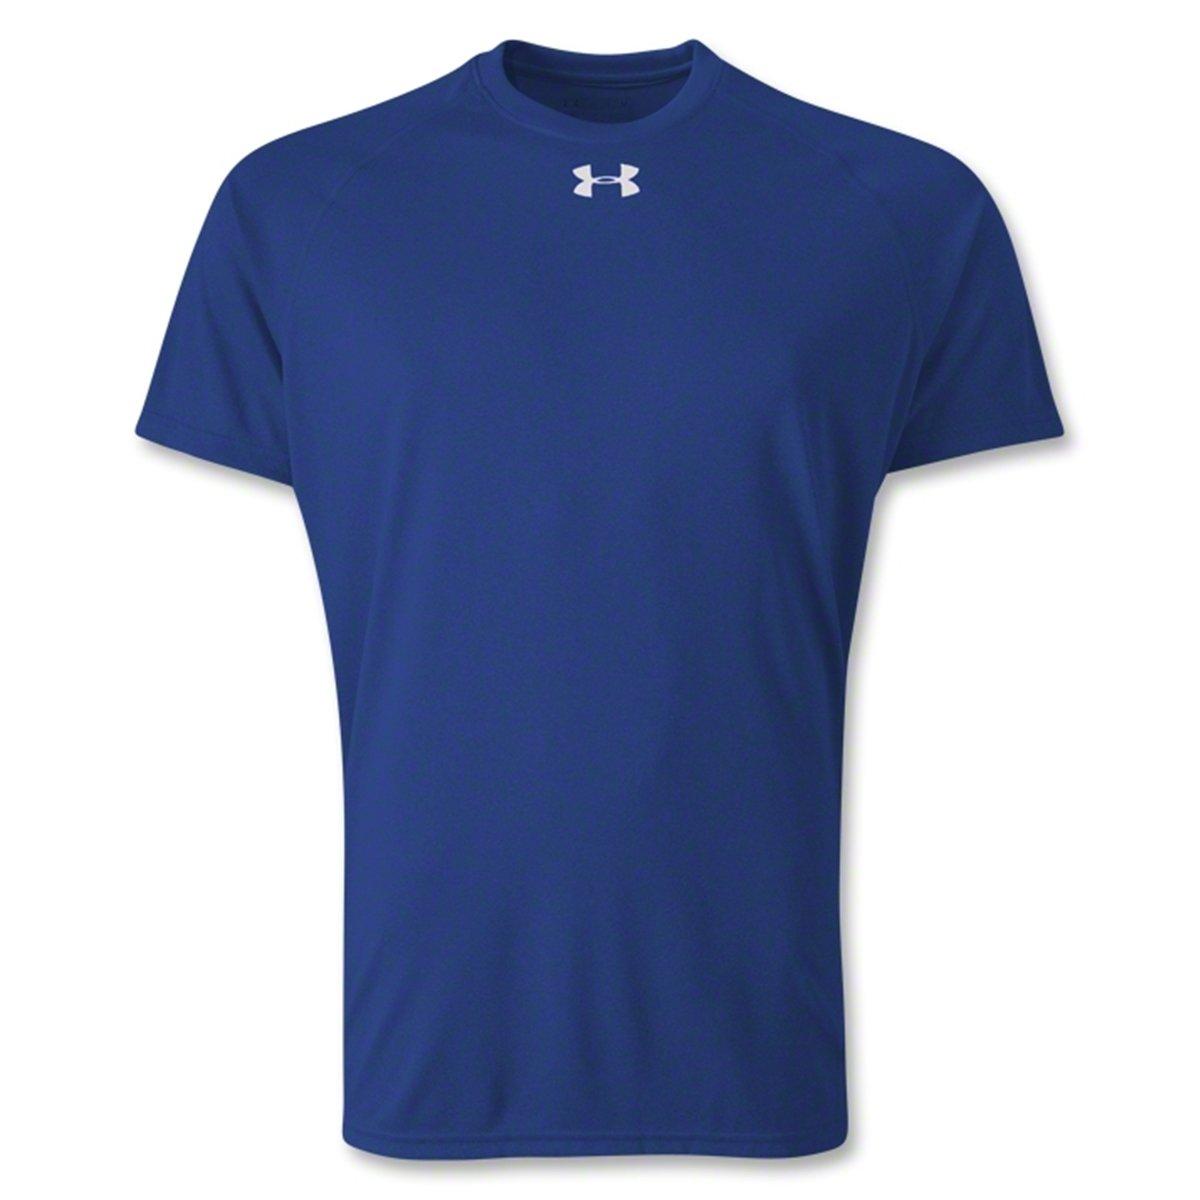 cf073214 Under Armour Men's Locker Short Sleeve T-Shirt Royal Small ...